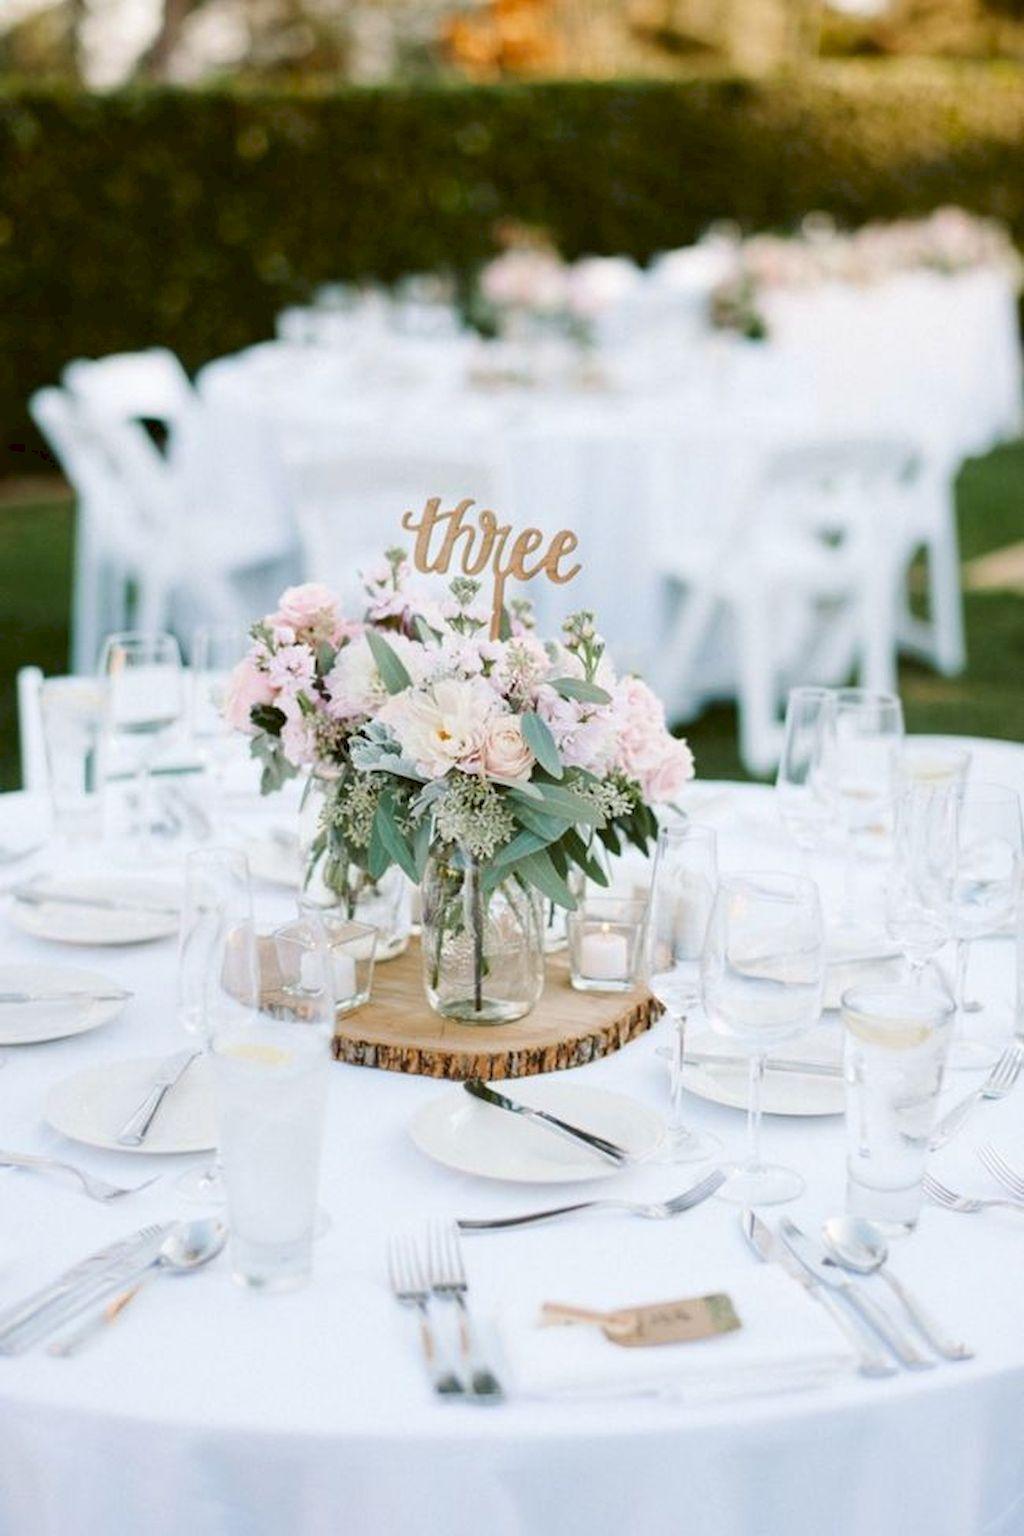 41 simple greenery wedding centerpieces decor ideas wedding 41 simple greenery wedding centerpieces decor ideas junglespirit Gallery